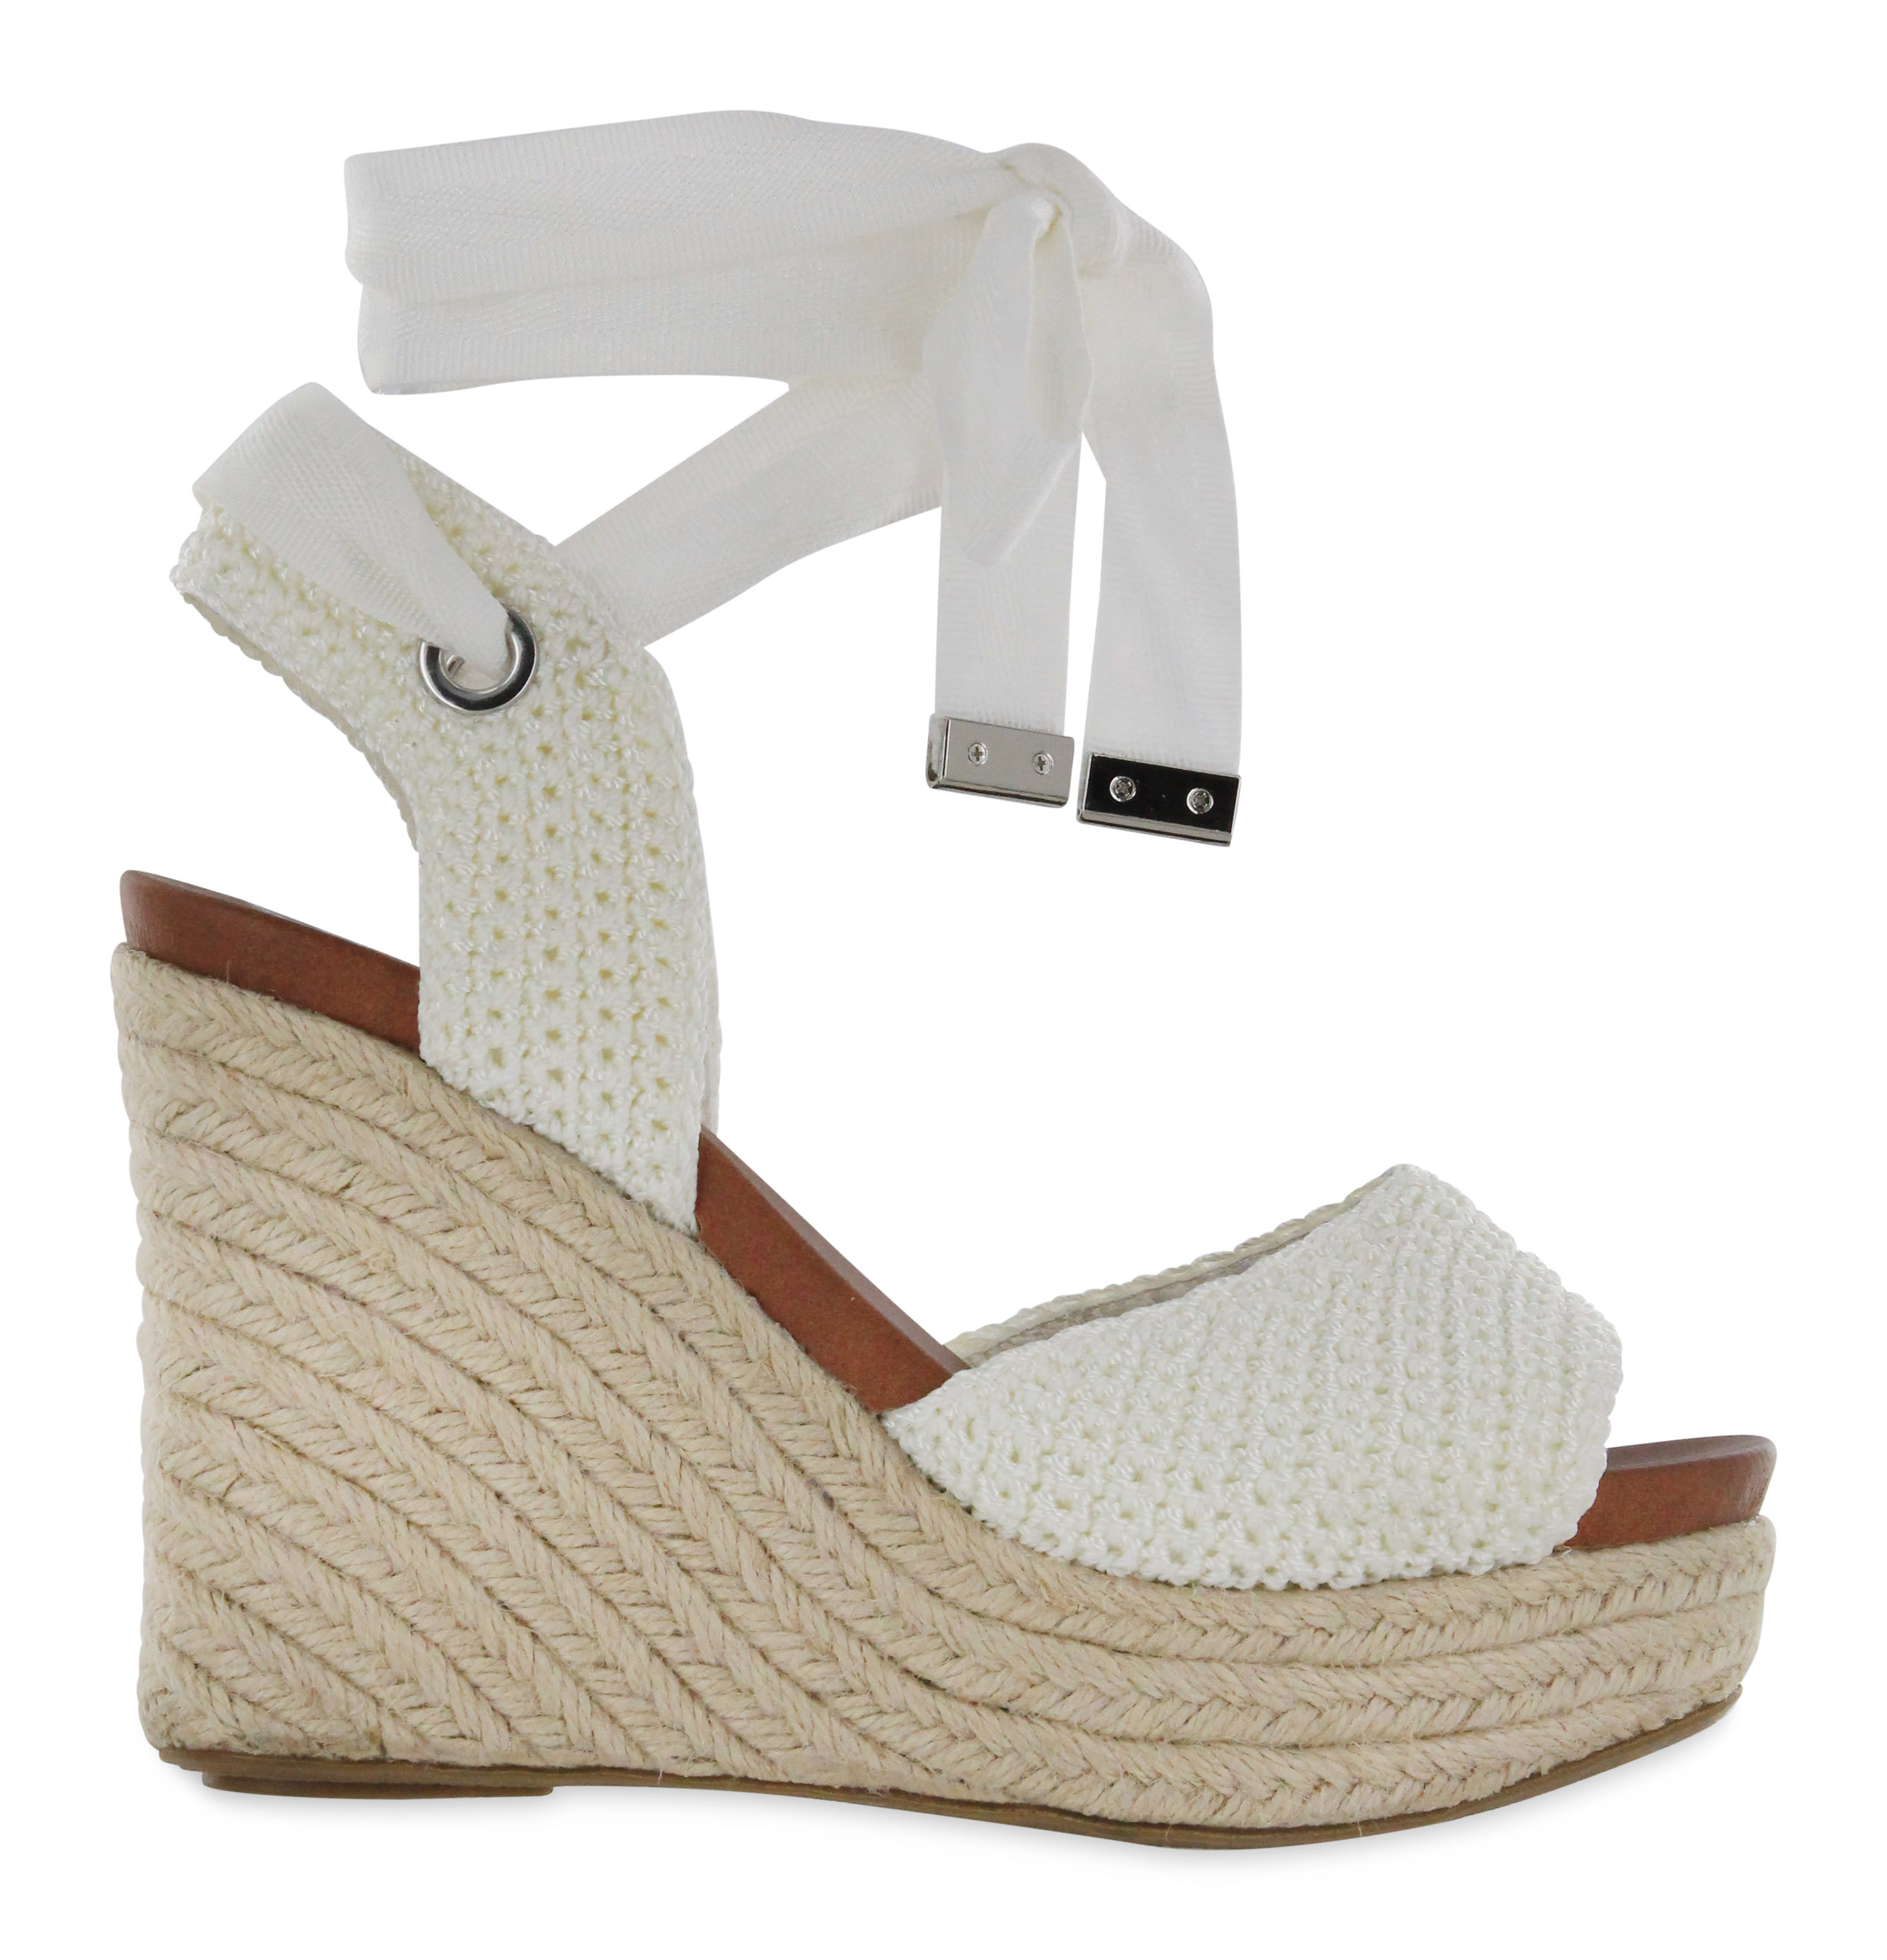 Mia Yanet Espadrille Wedge Sandal - white - Back